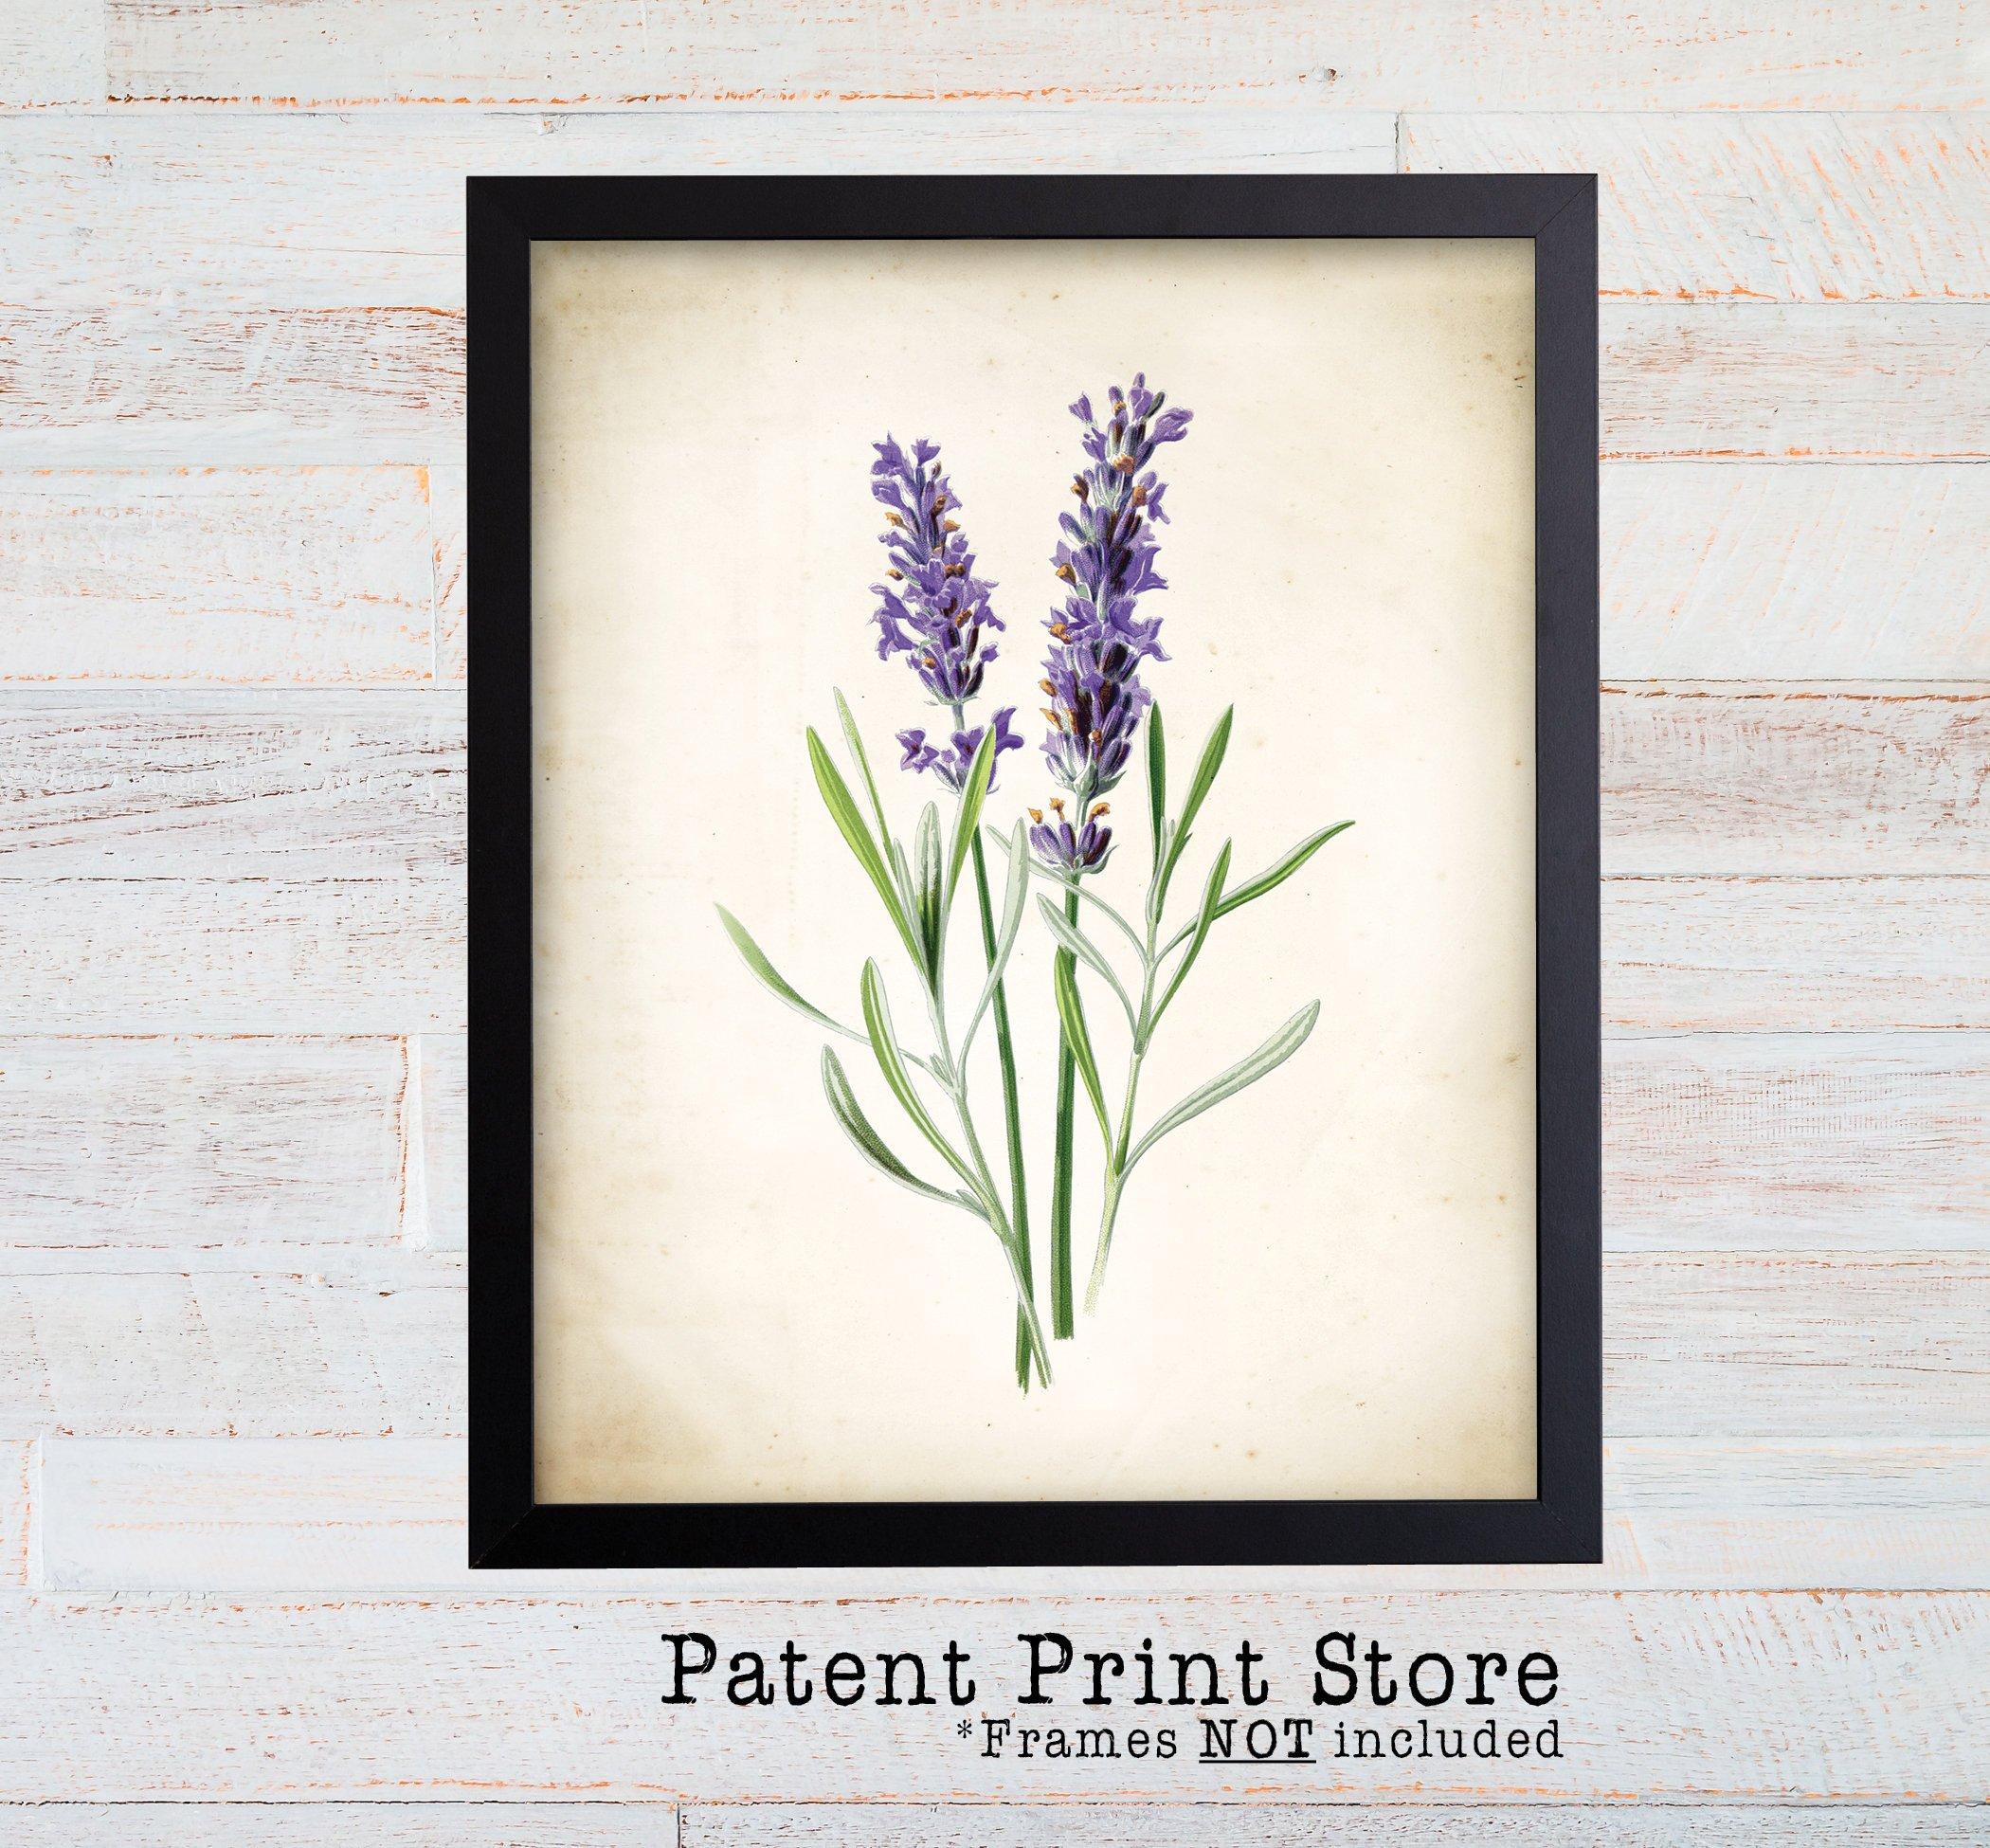 2100x1950 Vintage Watercolor Lavender Print. Botanical Print. Art Print